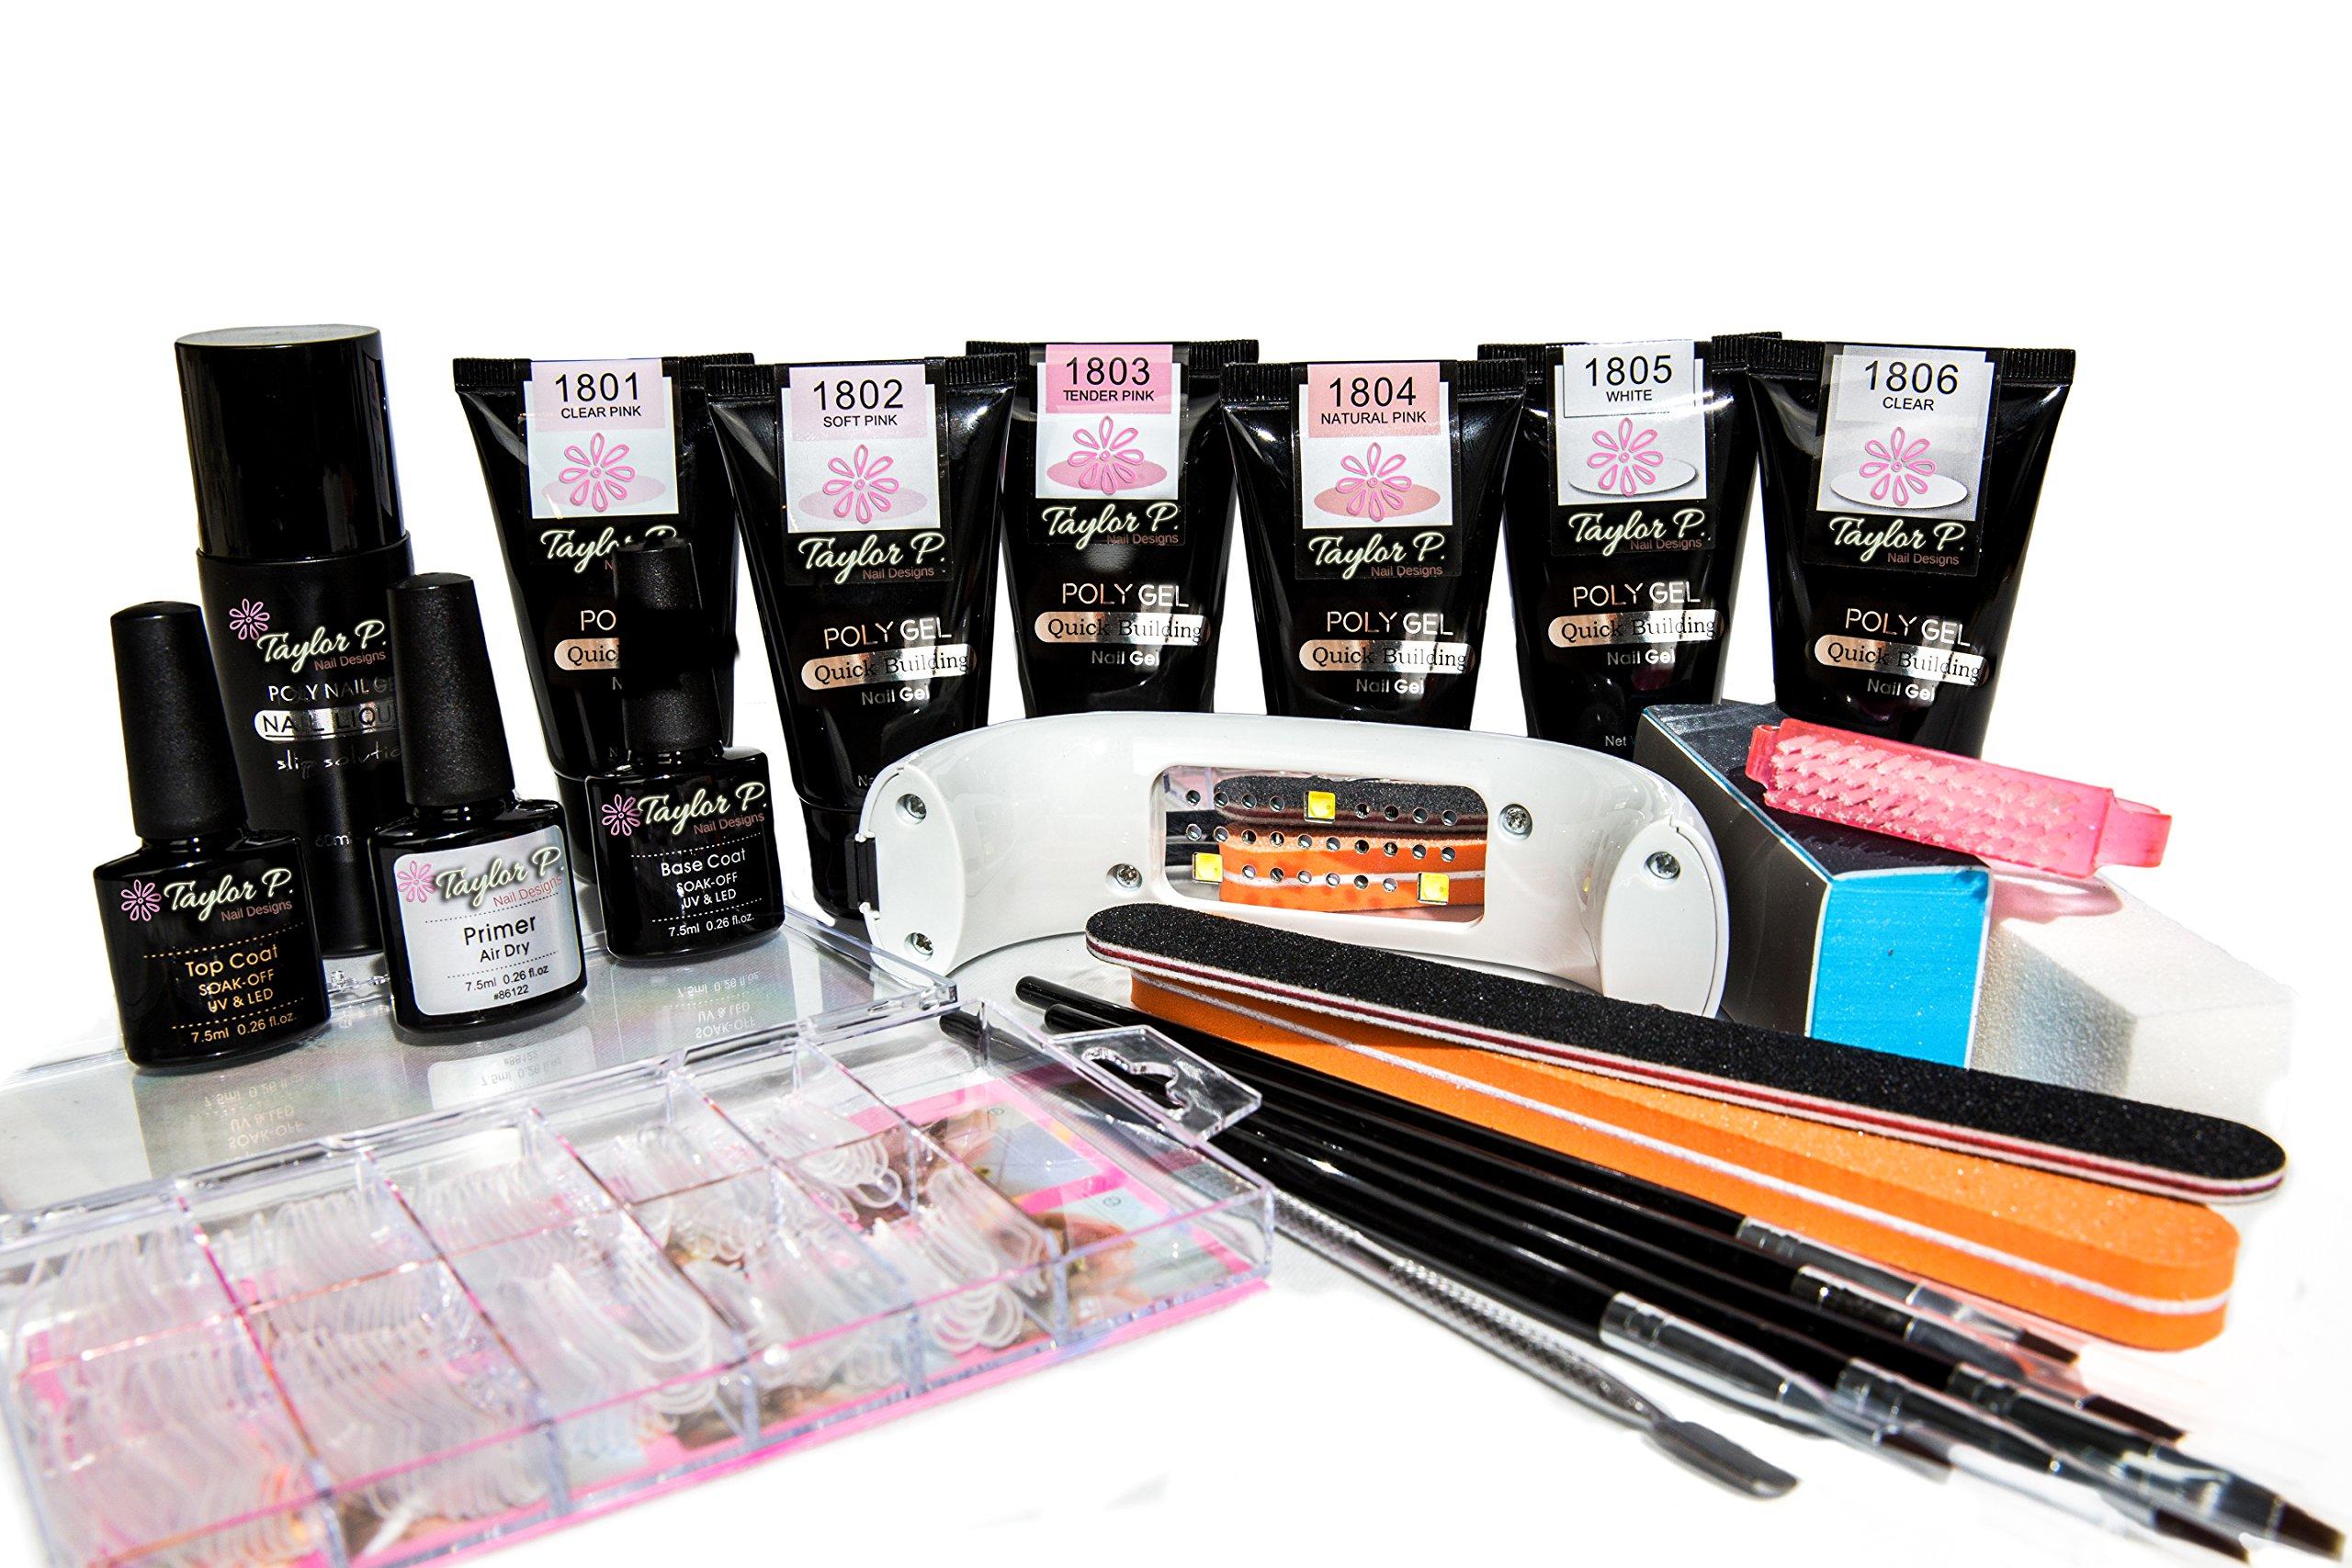 Taylor P. Poly Gel UV LED Curable Master Kit